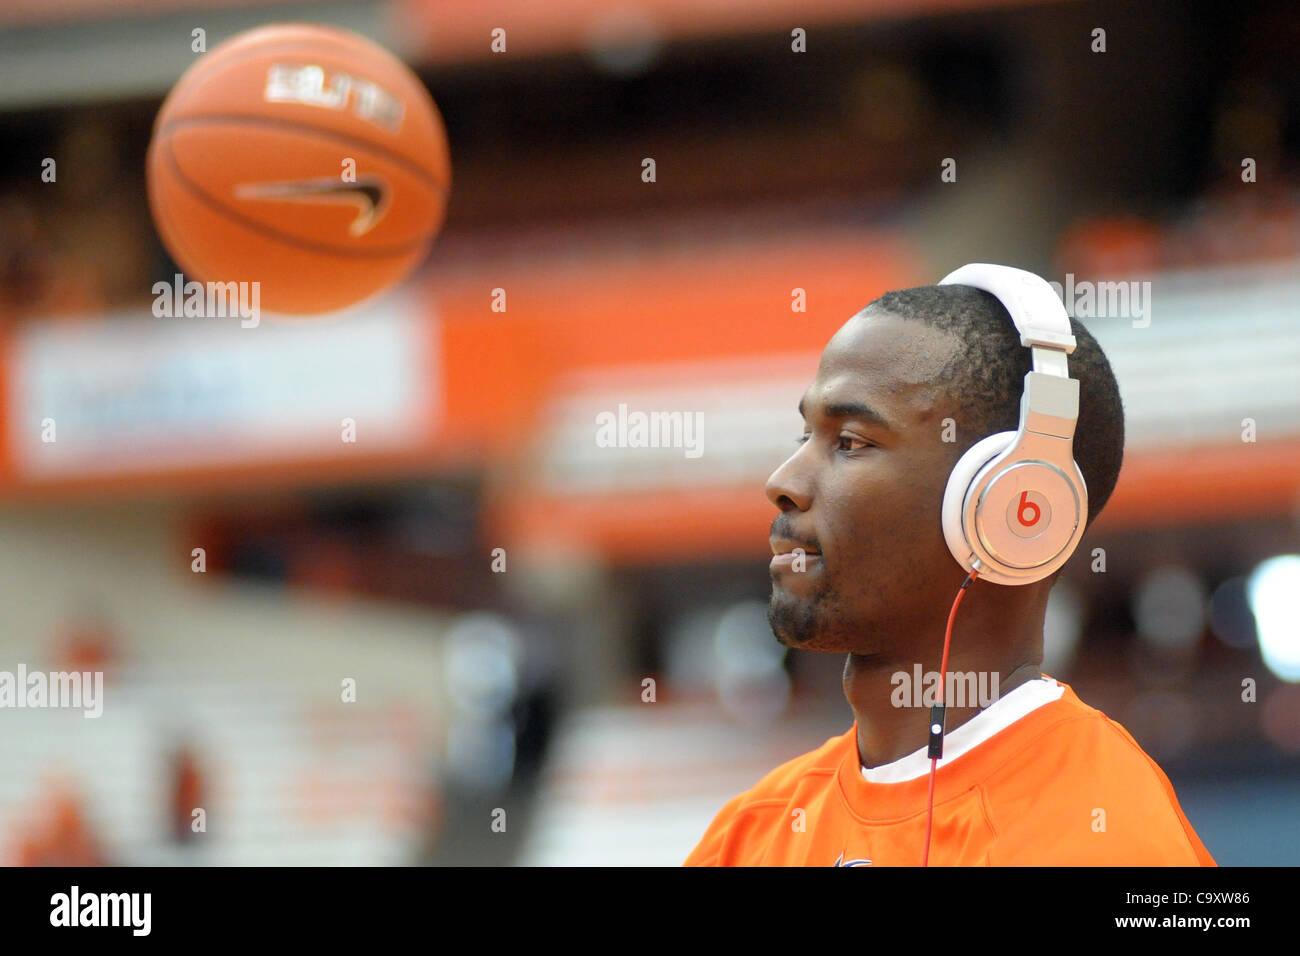 March 3, 2012 - Syracuse, New York, U.S - Syracuse Orange center Baye Keita (12) listens to music while getting - Stock Image